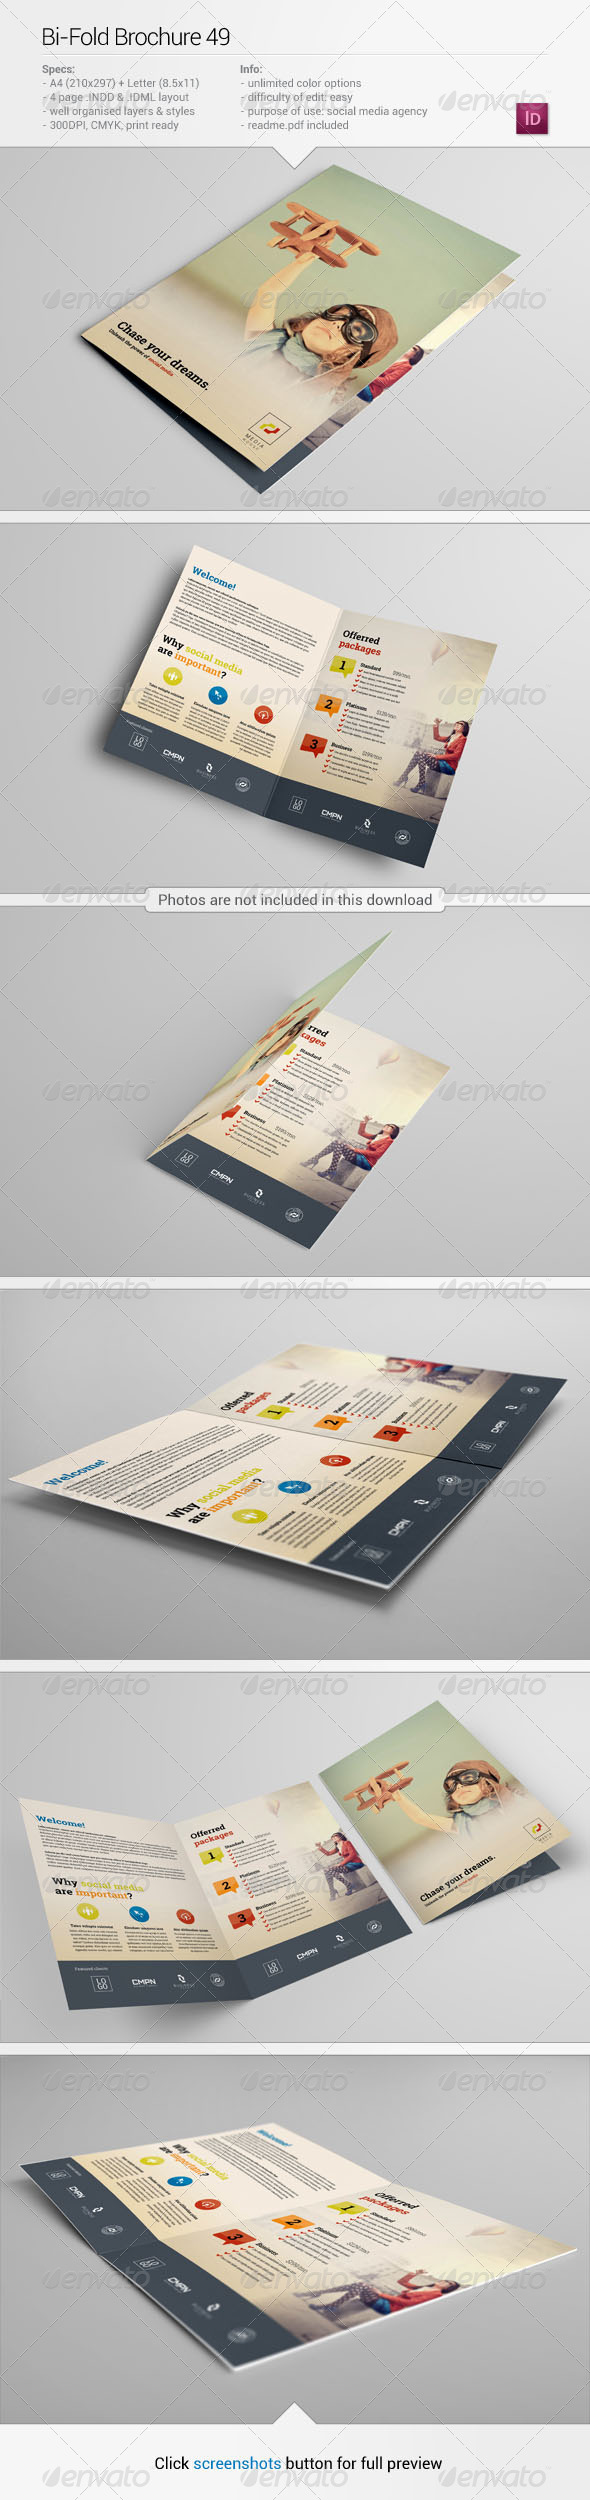 GraphicRiver Bi-Fold Brochure 49 6337806